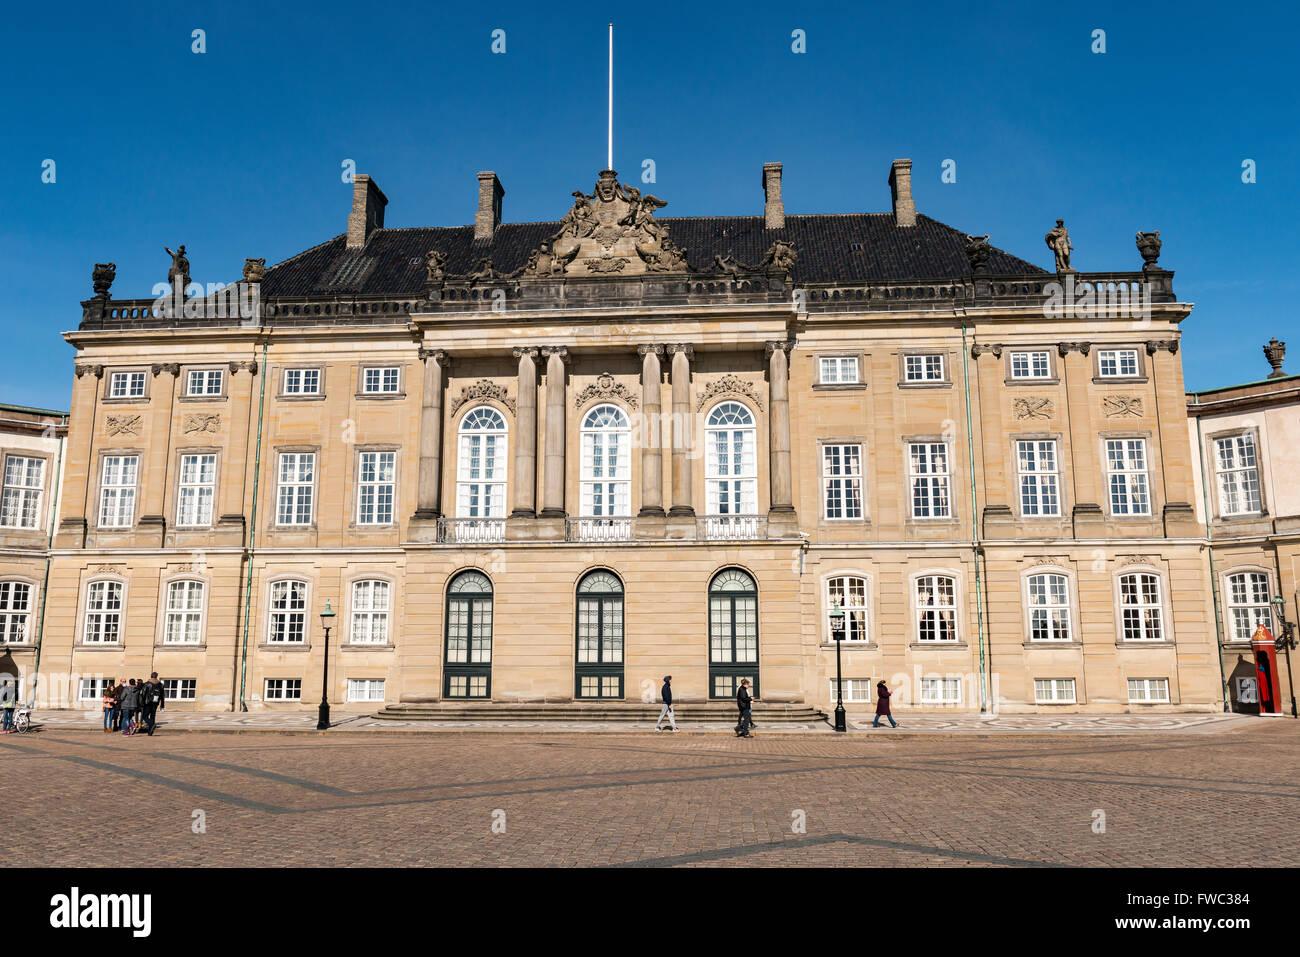 Frederiksstaden - Stock Image